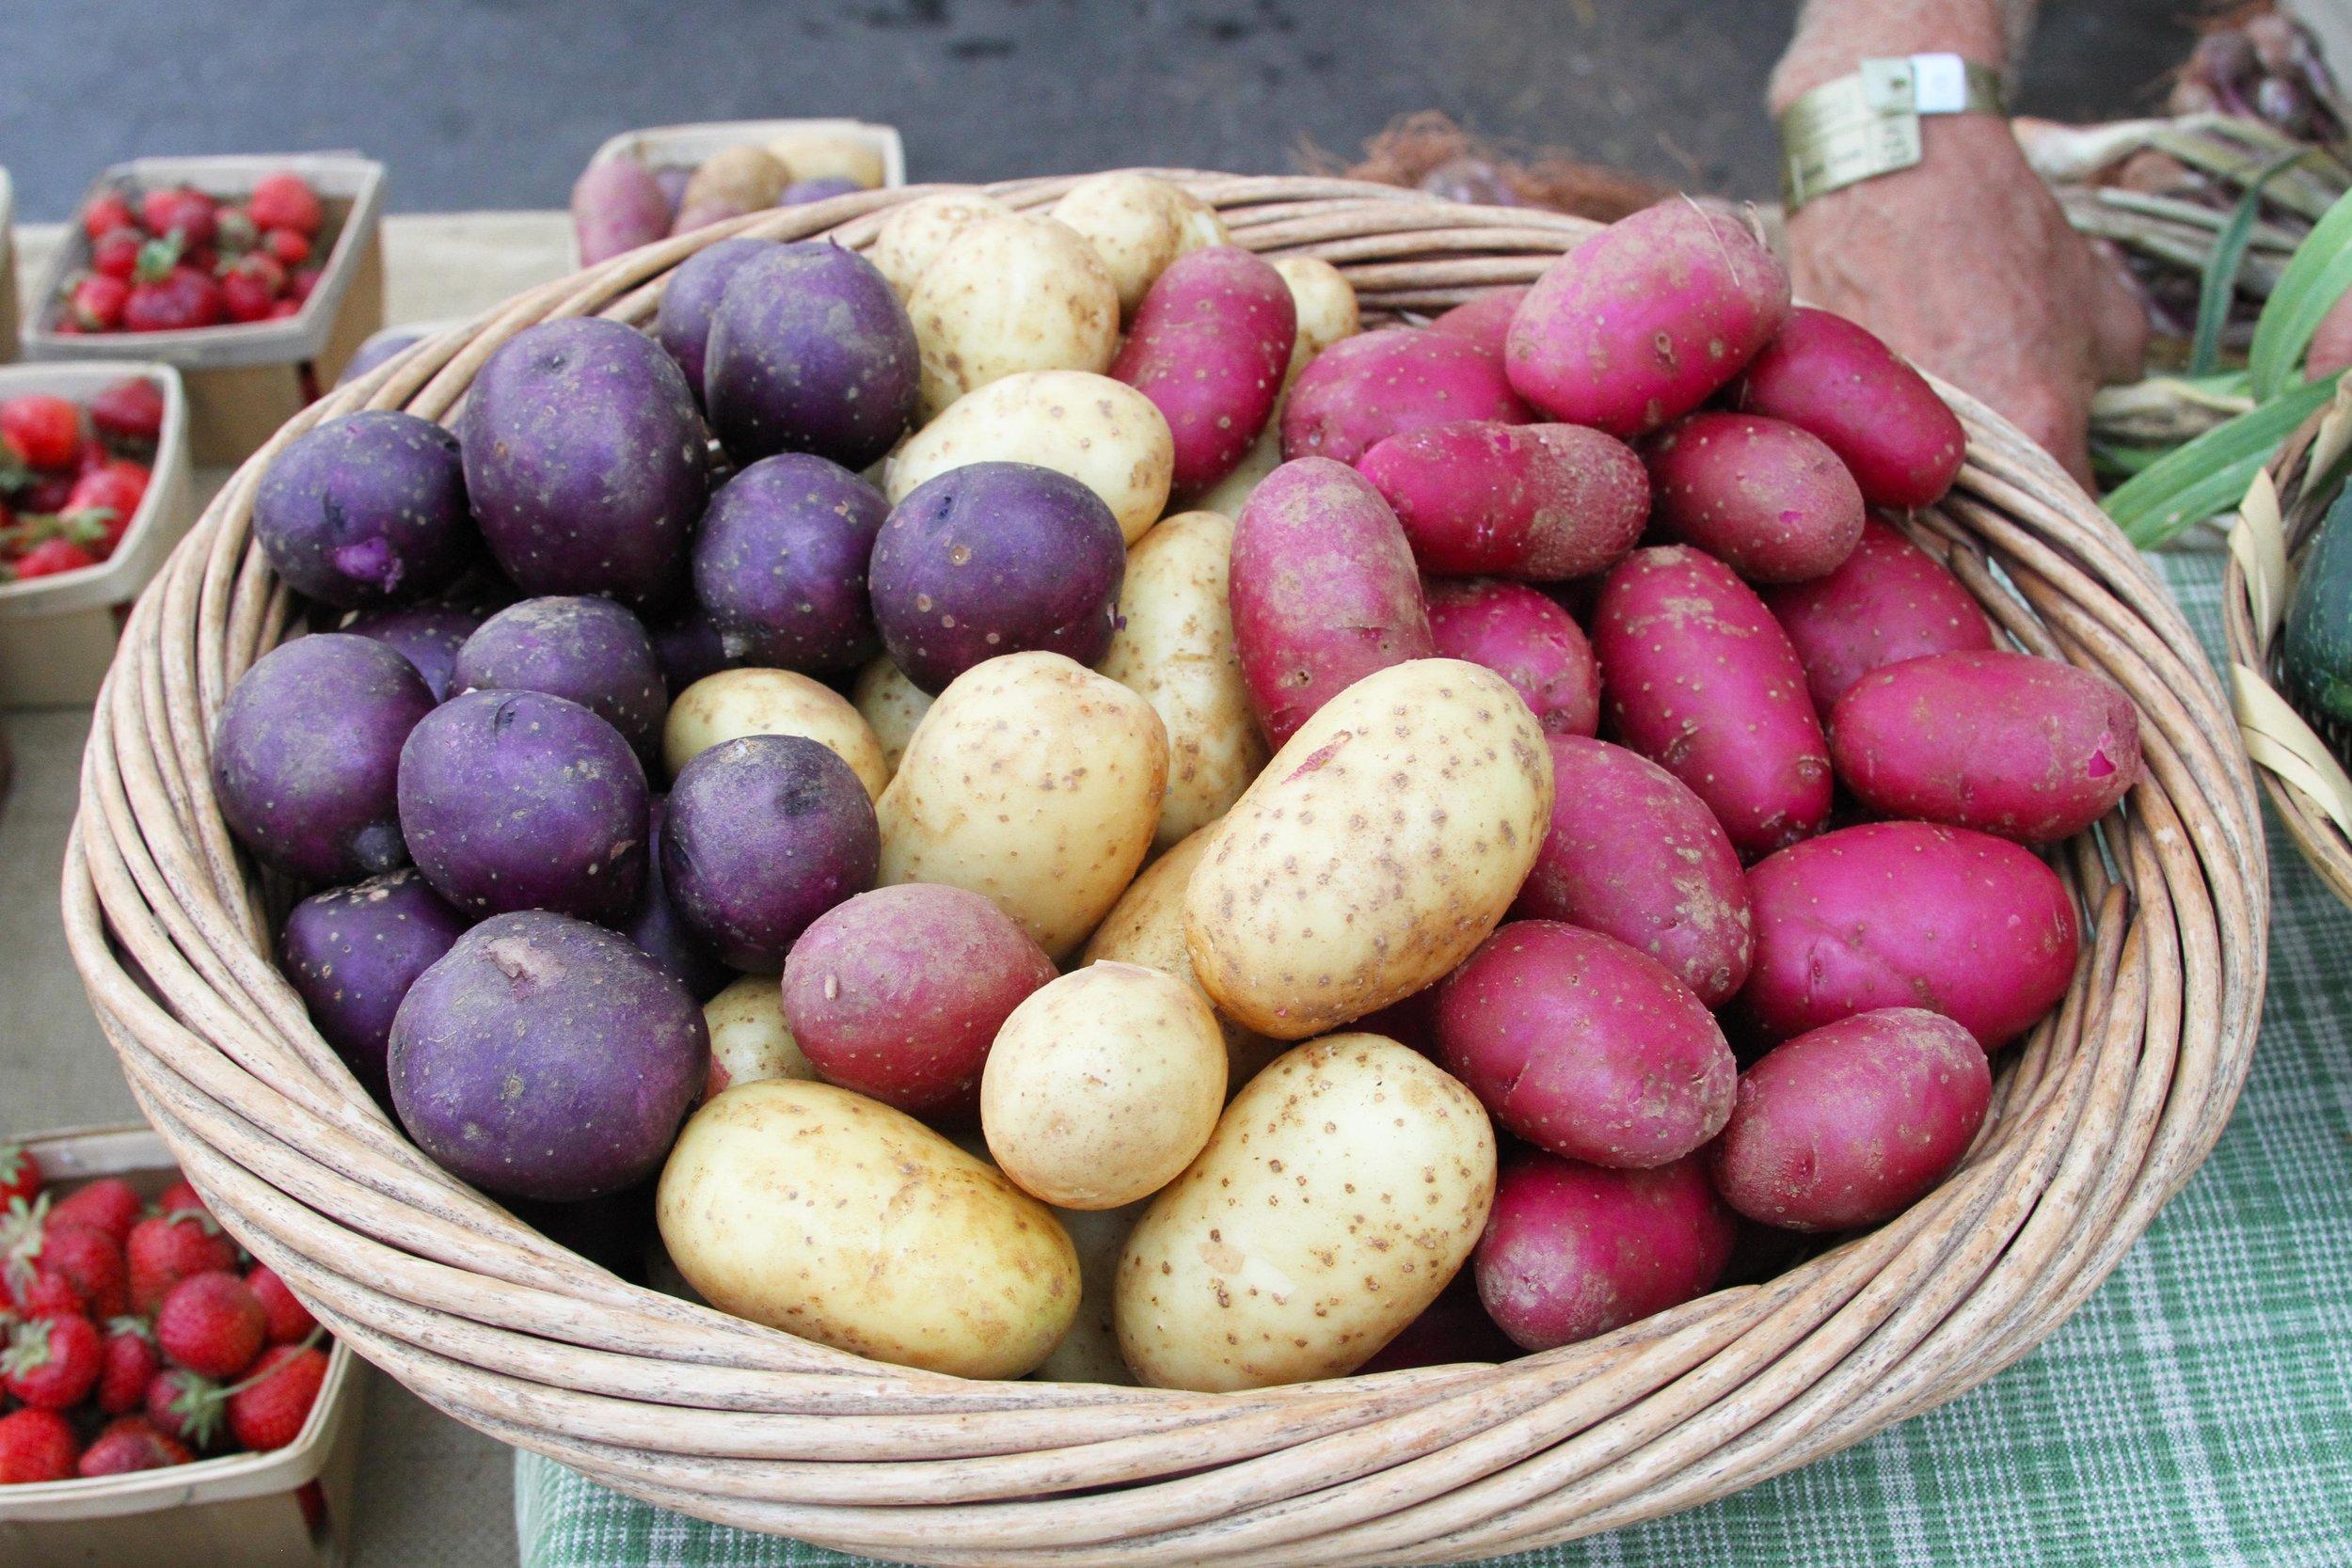 CCBC_FarmersMarket_Potatoes.jpg